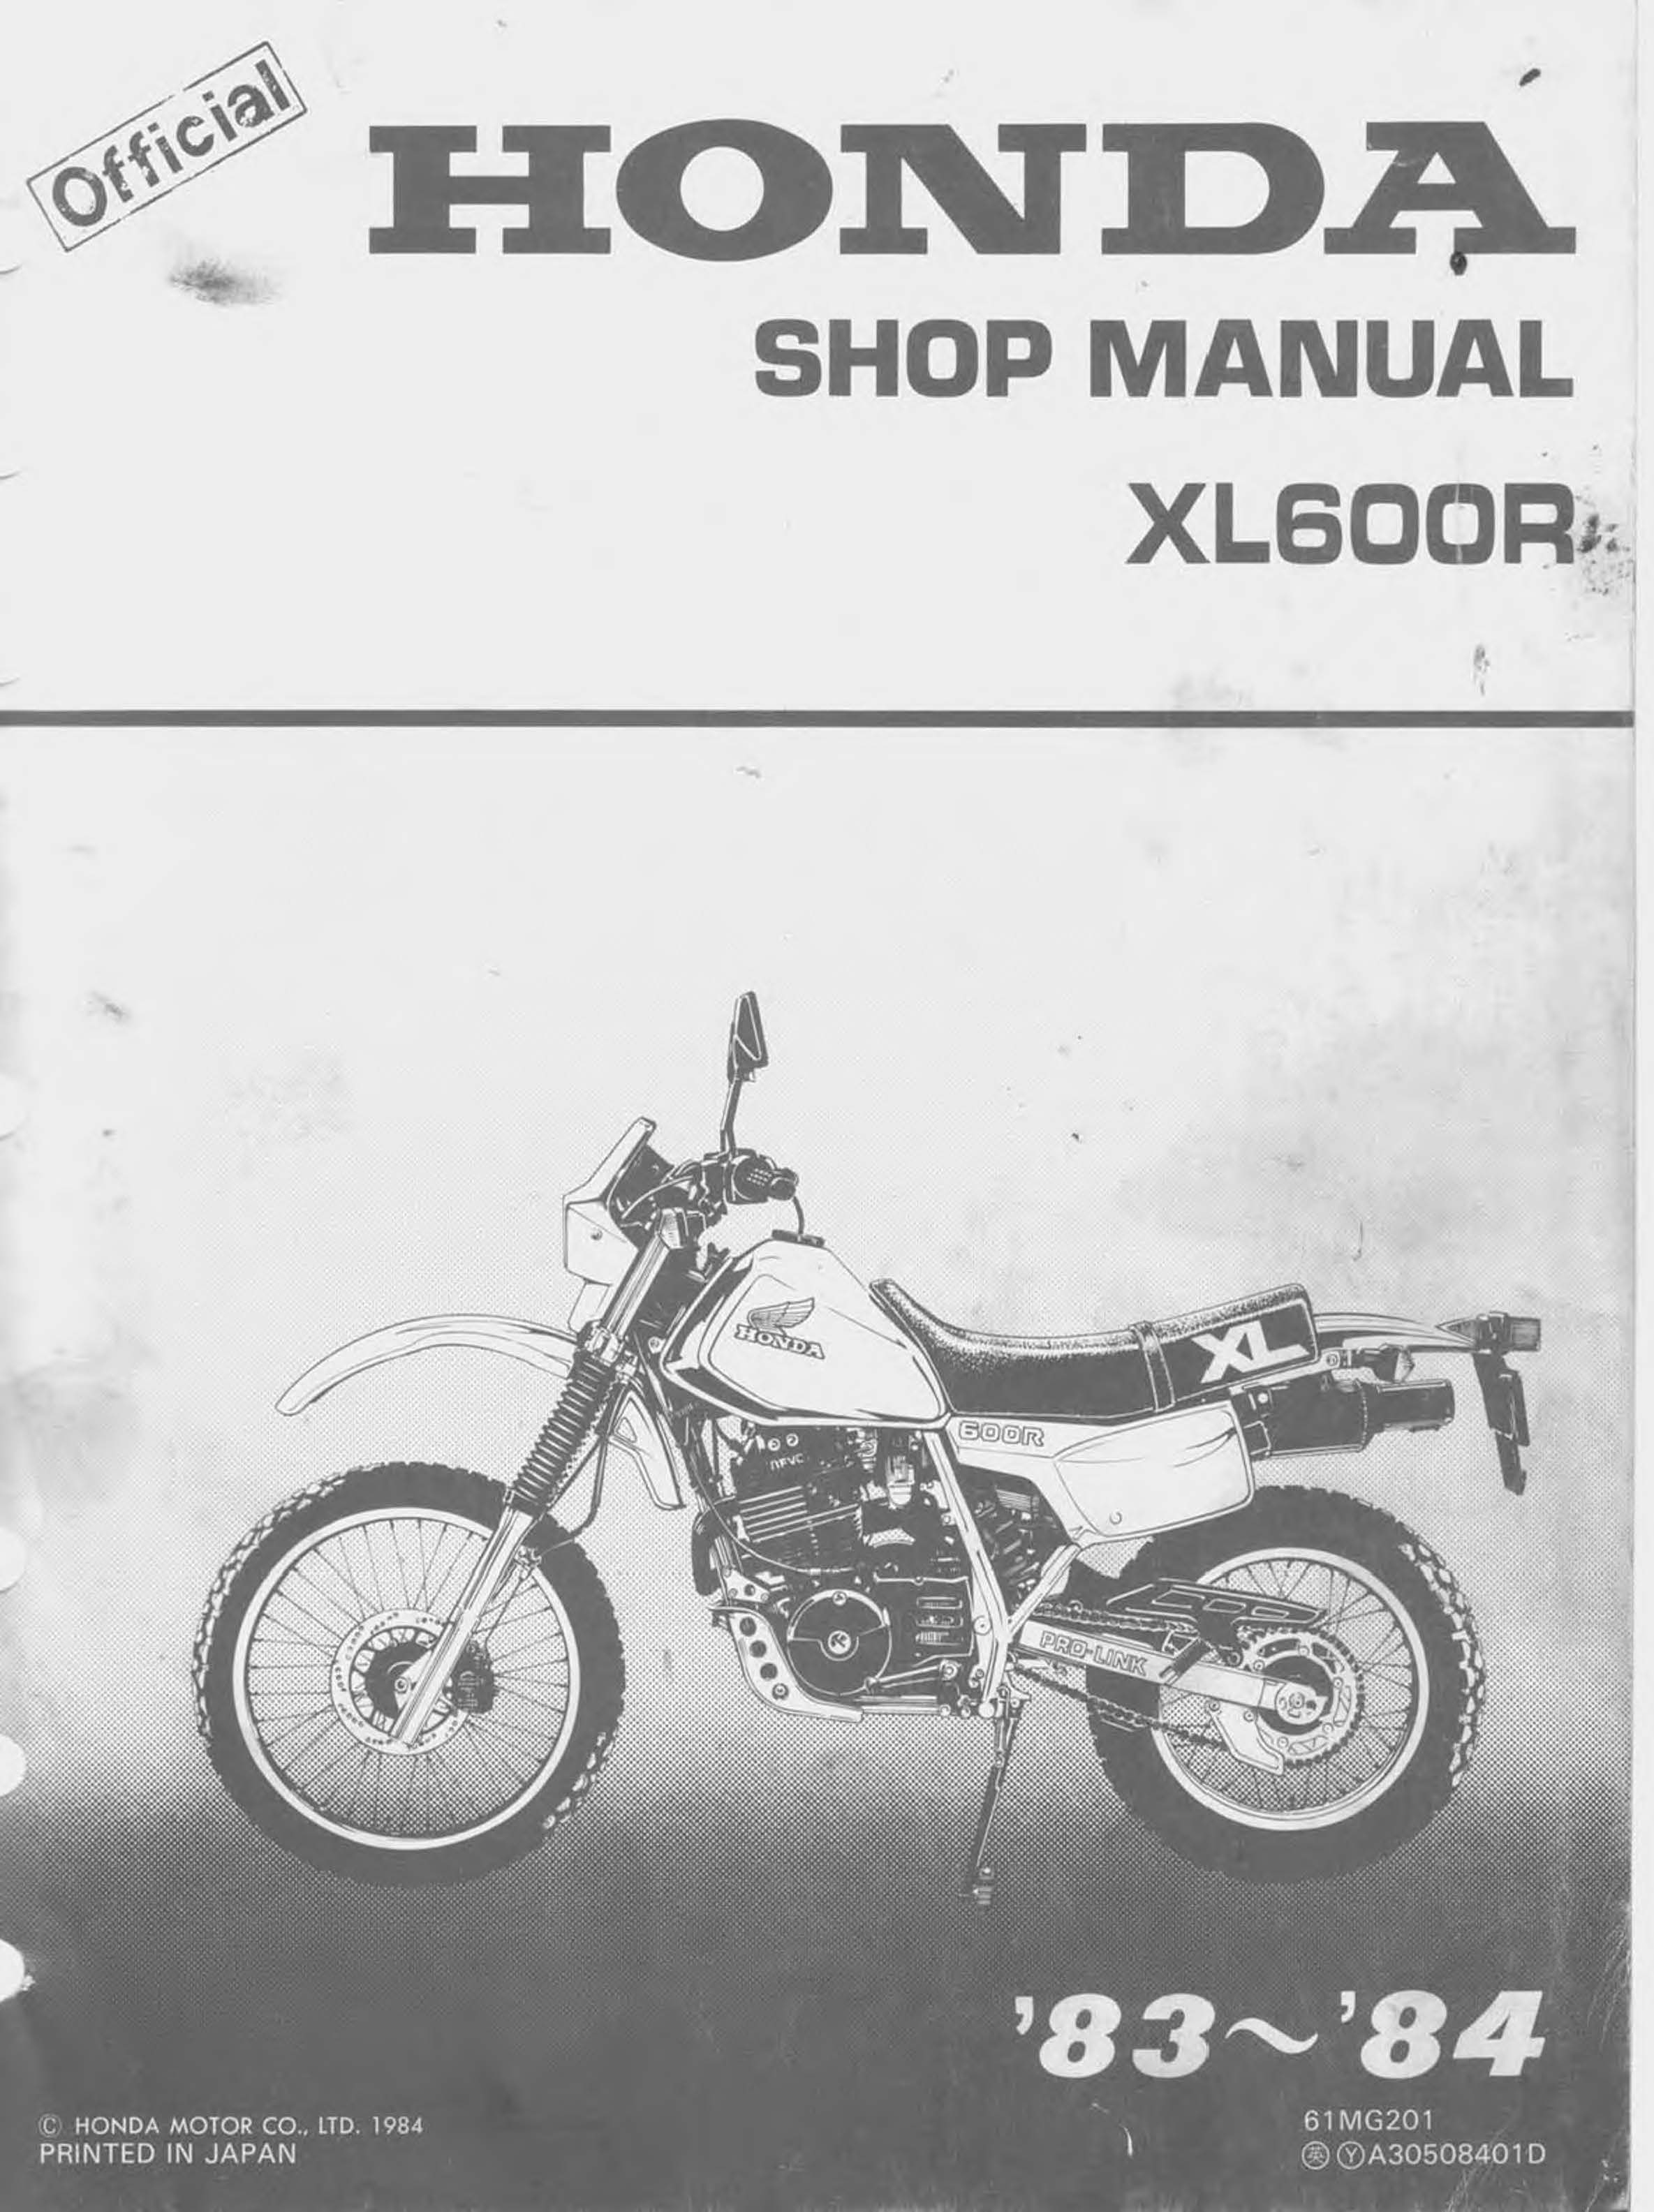 Workshop Manual for Honda XL600R (1983-1984)